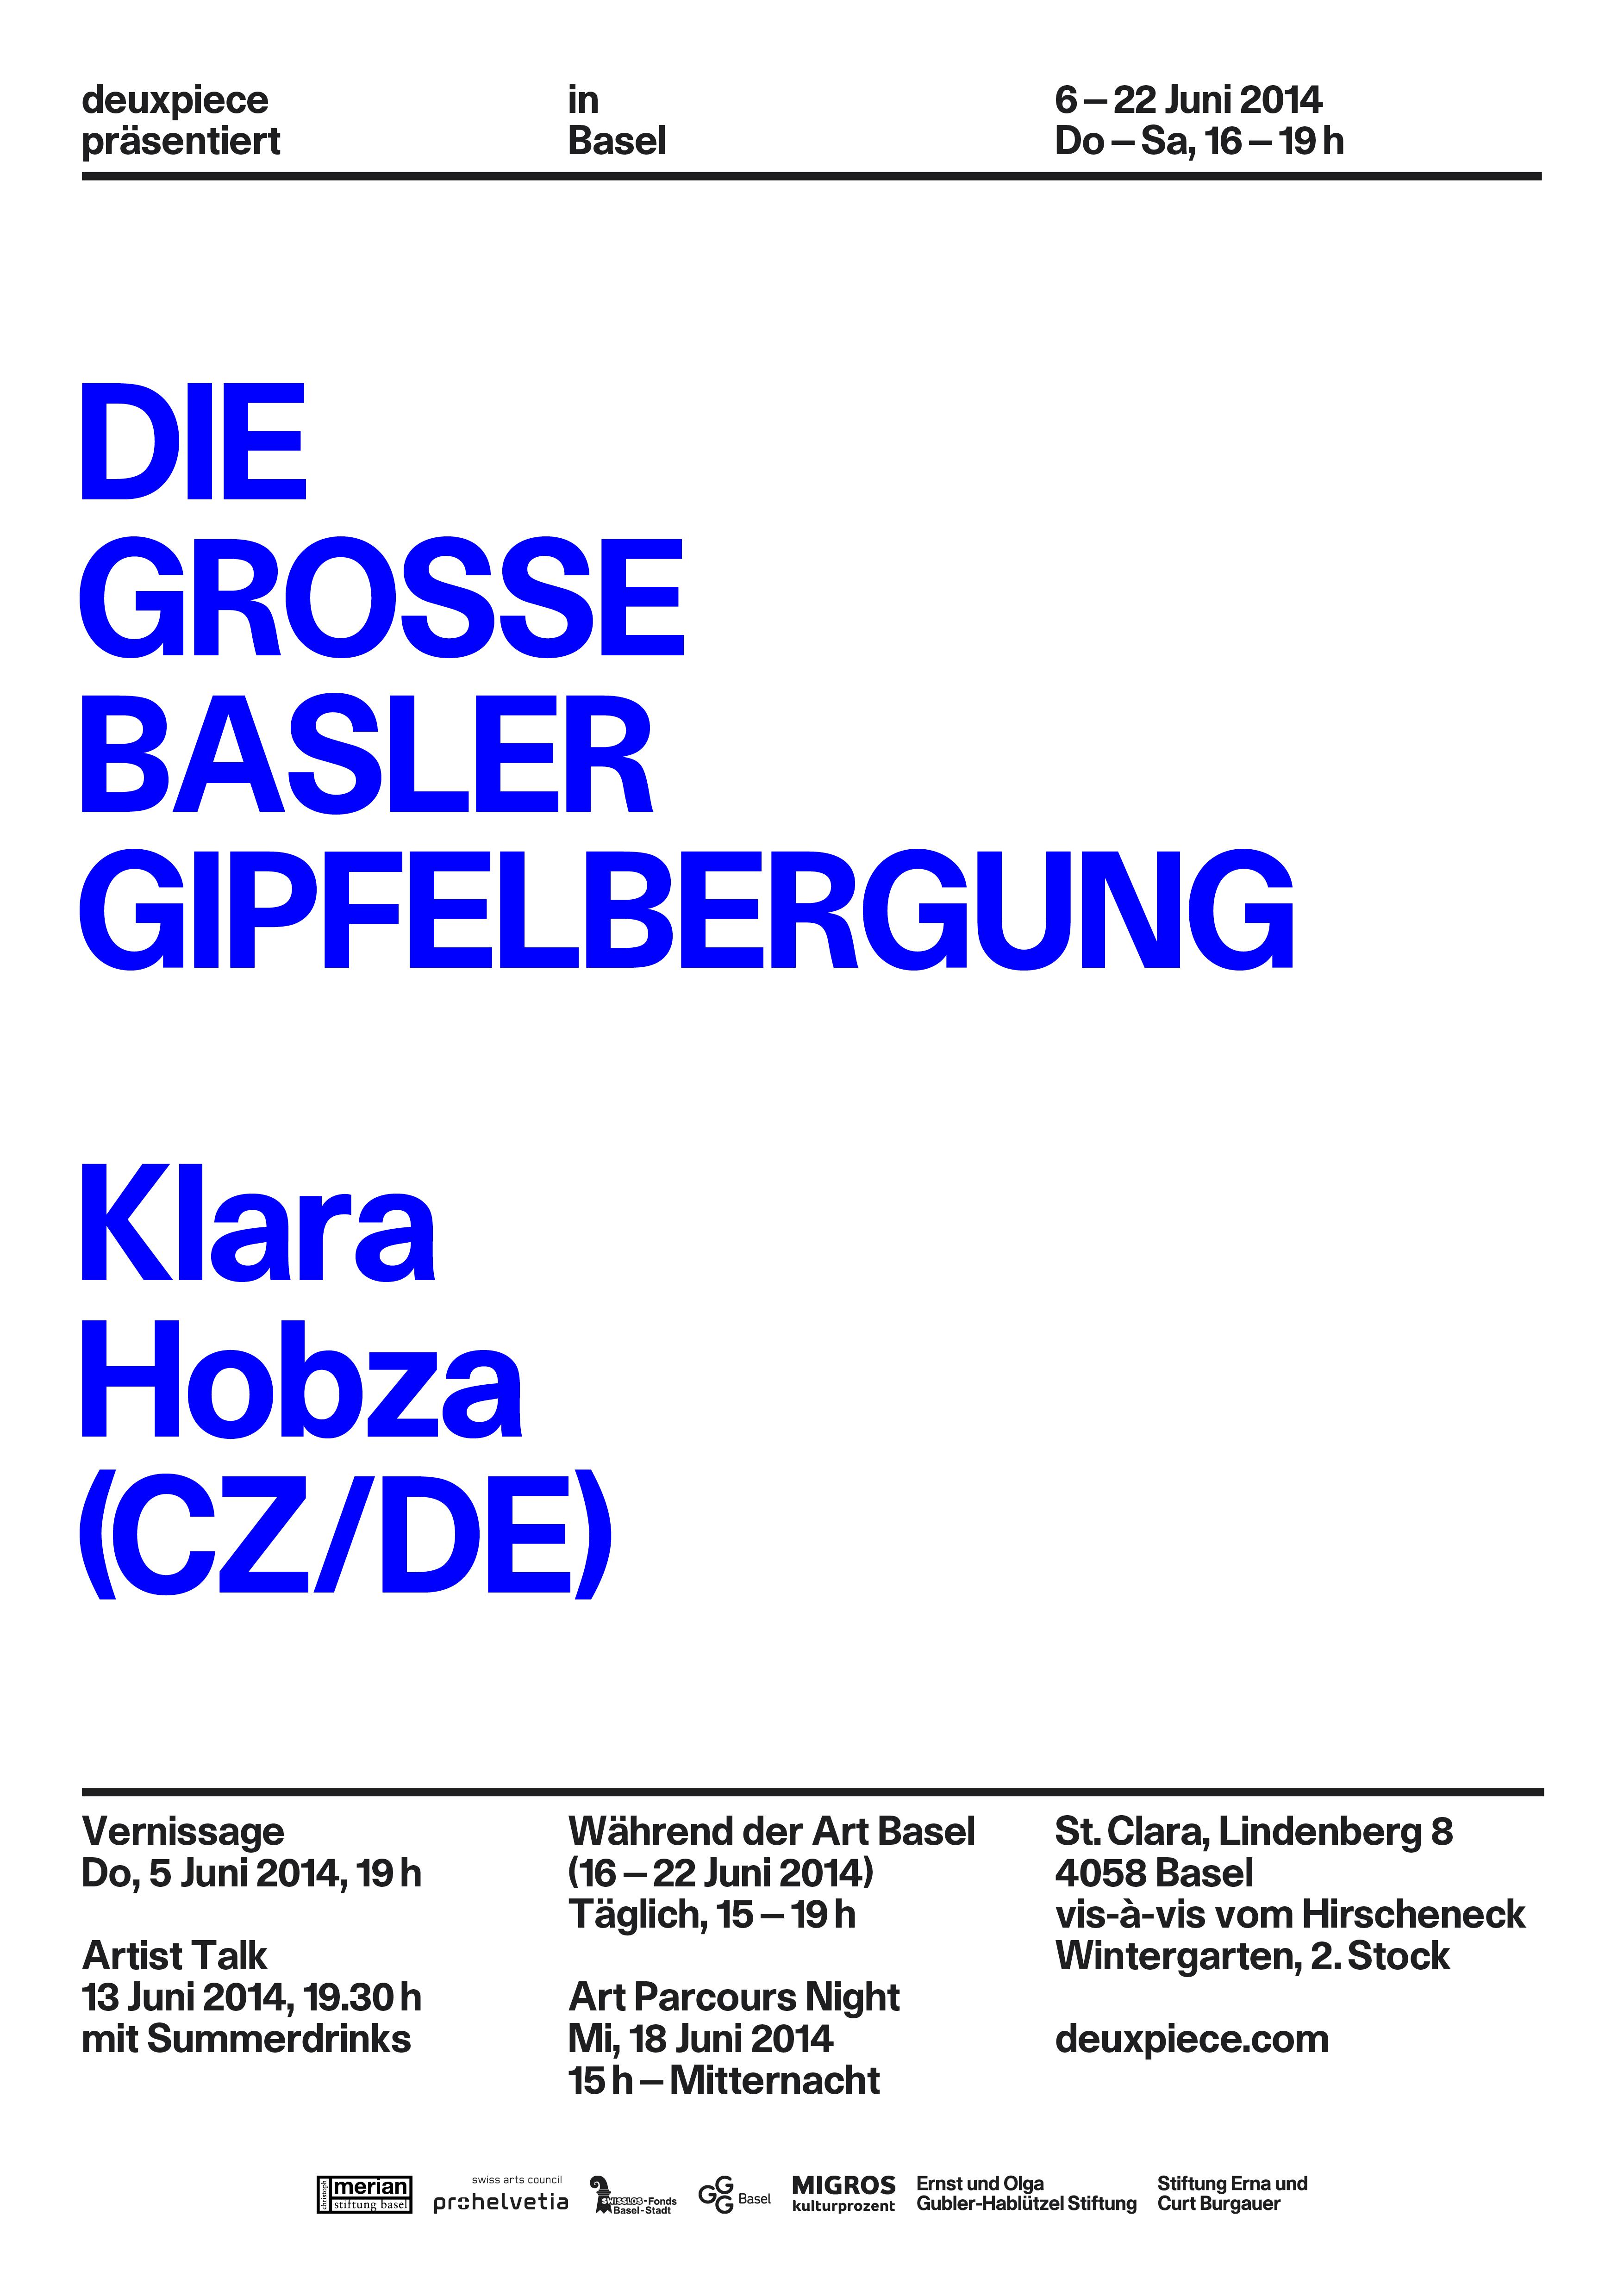 deuxpiece_2014-02_Poster_04_farbig